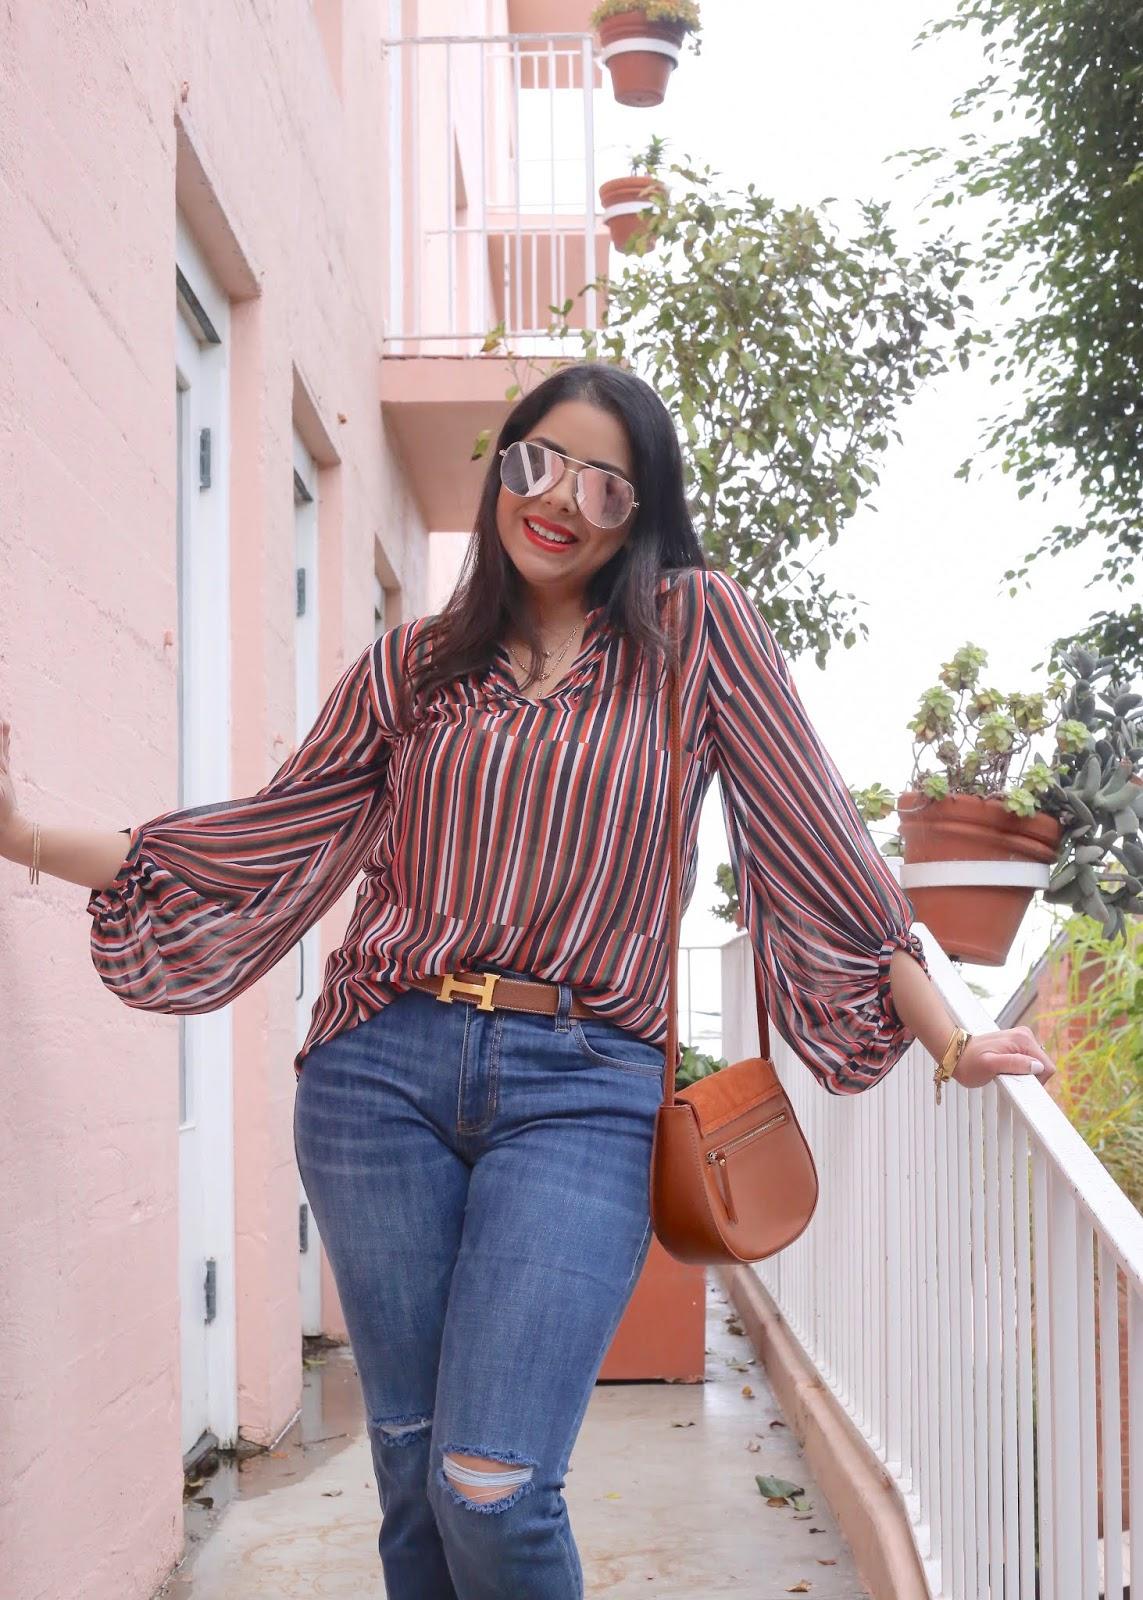 hermes belt outfit, orange lipstick, quay rosegold sunglasses